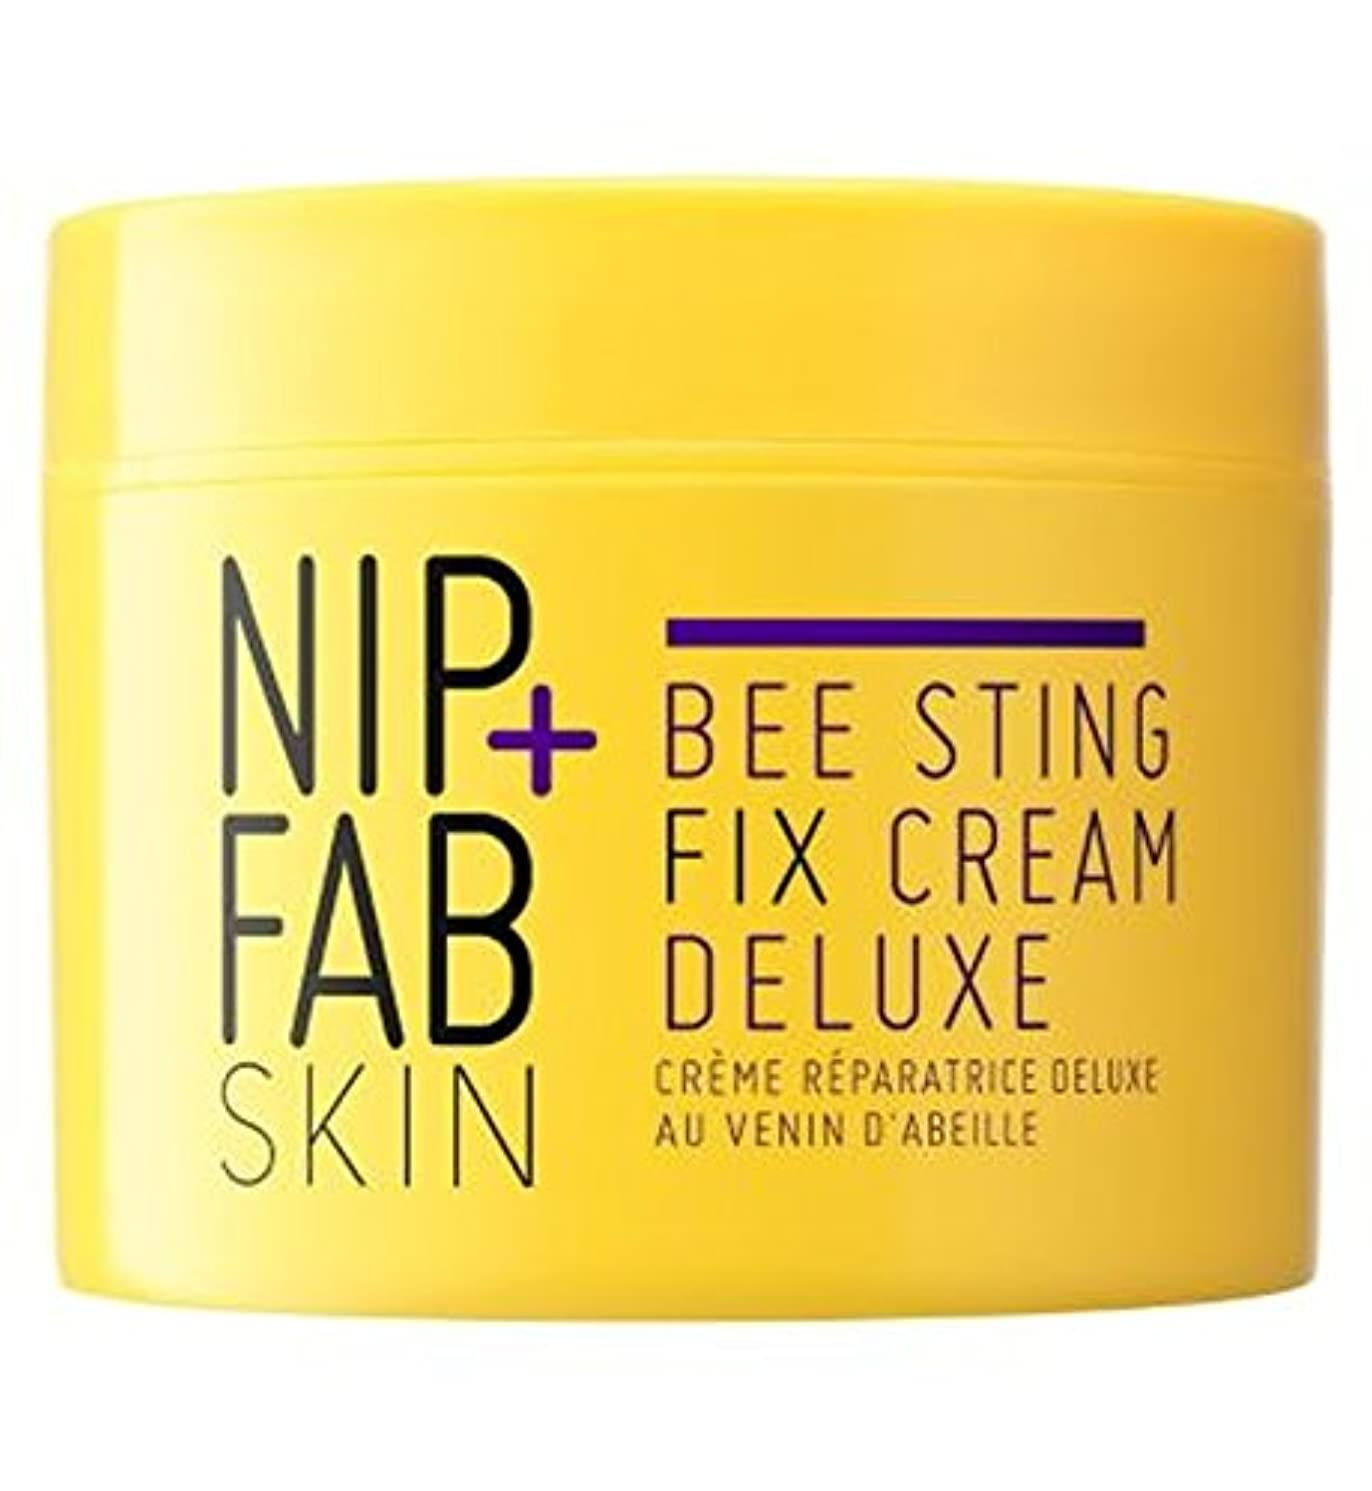 Nip+Fab Bee Sting Fix Deluxe Care - +ファブハチ刺されの修正デラックスケアニップ (Nip & Fab) [並行輸入品]